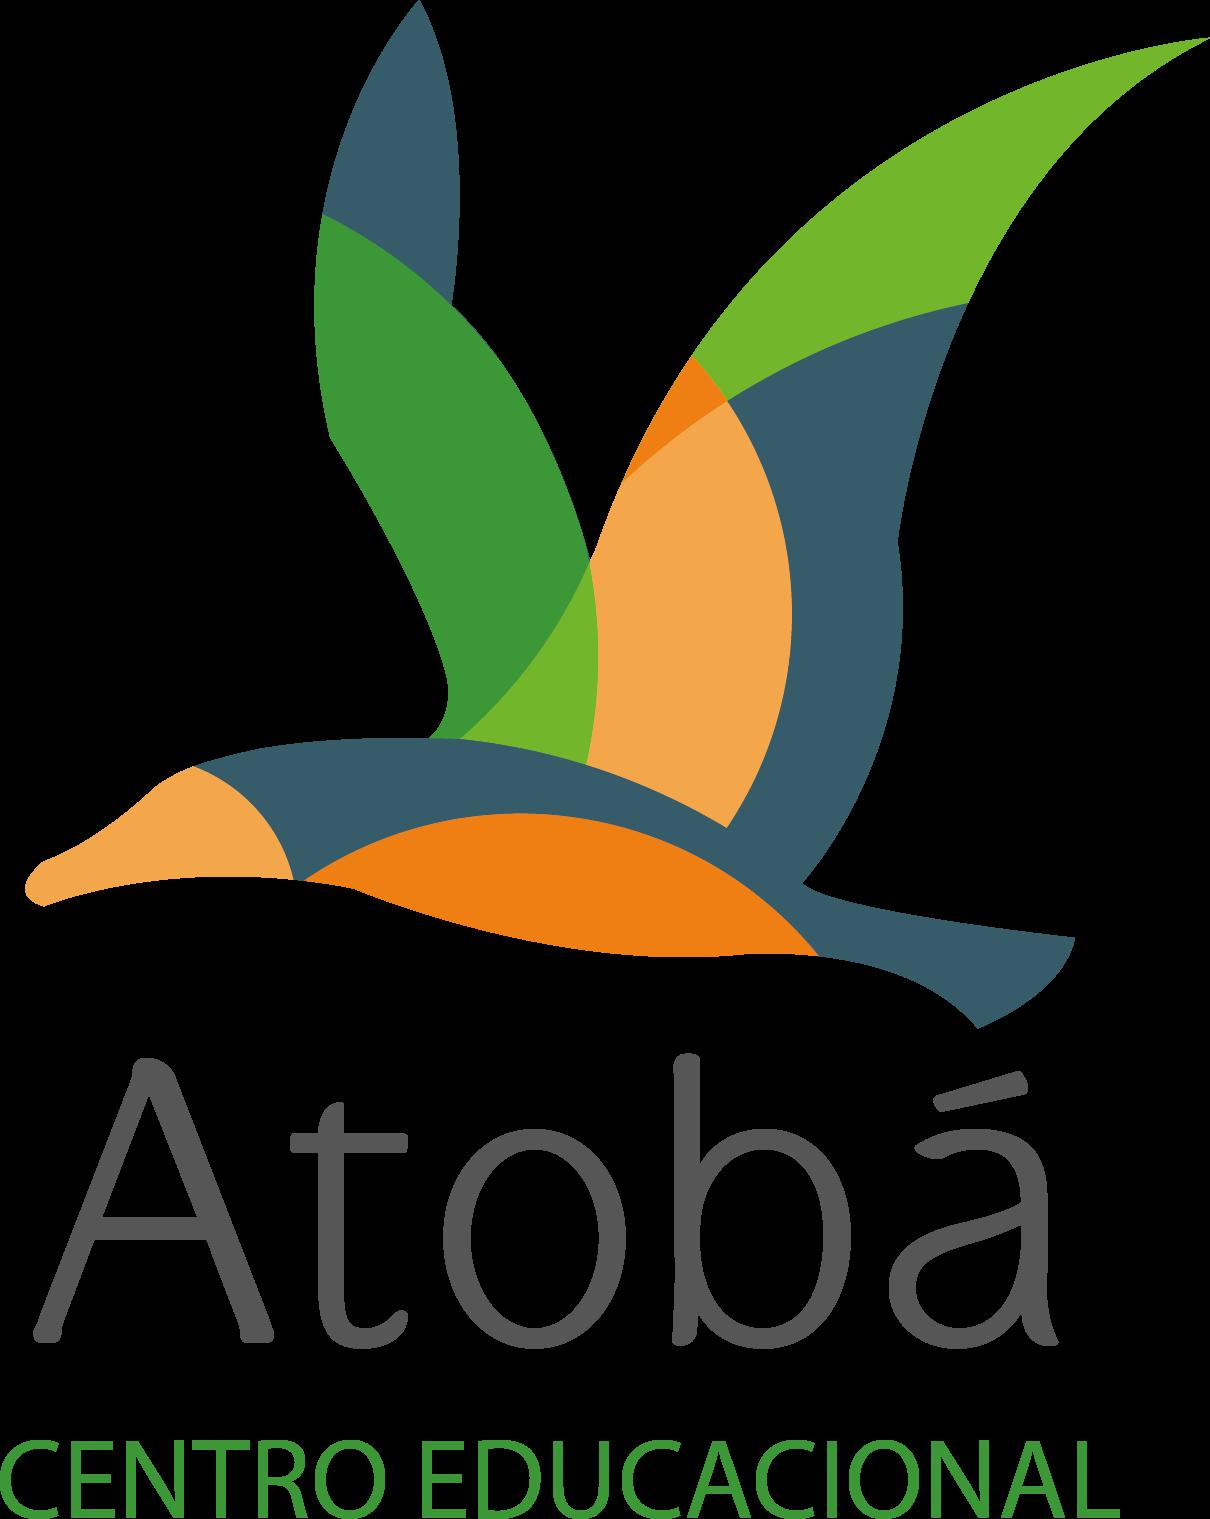 Atobá